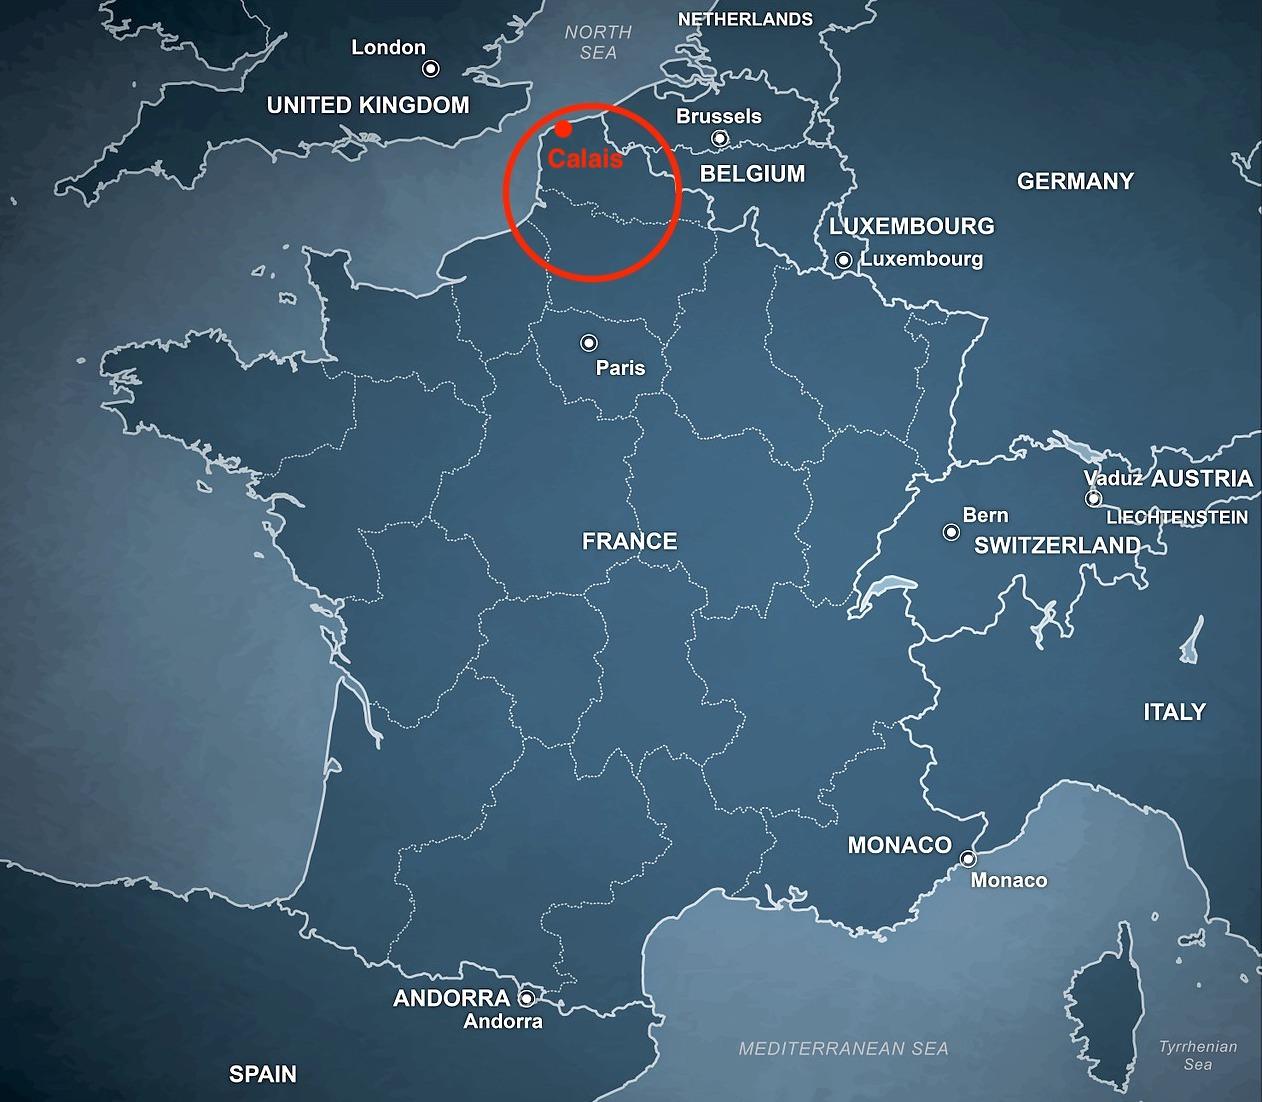 Calais and the greater area of Calais